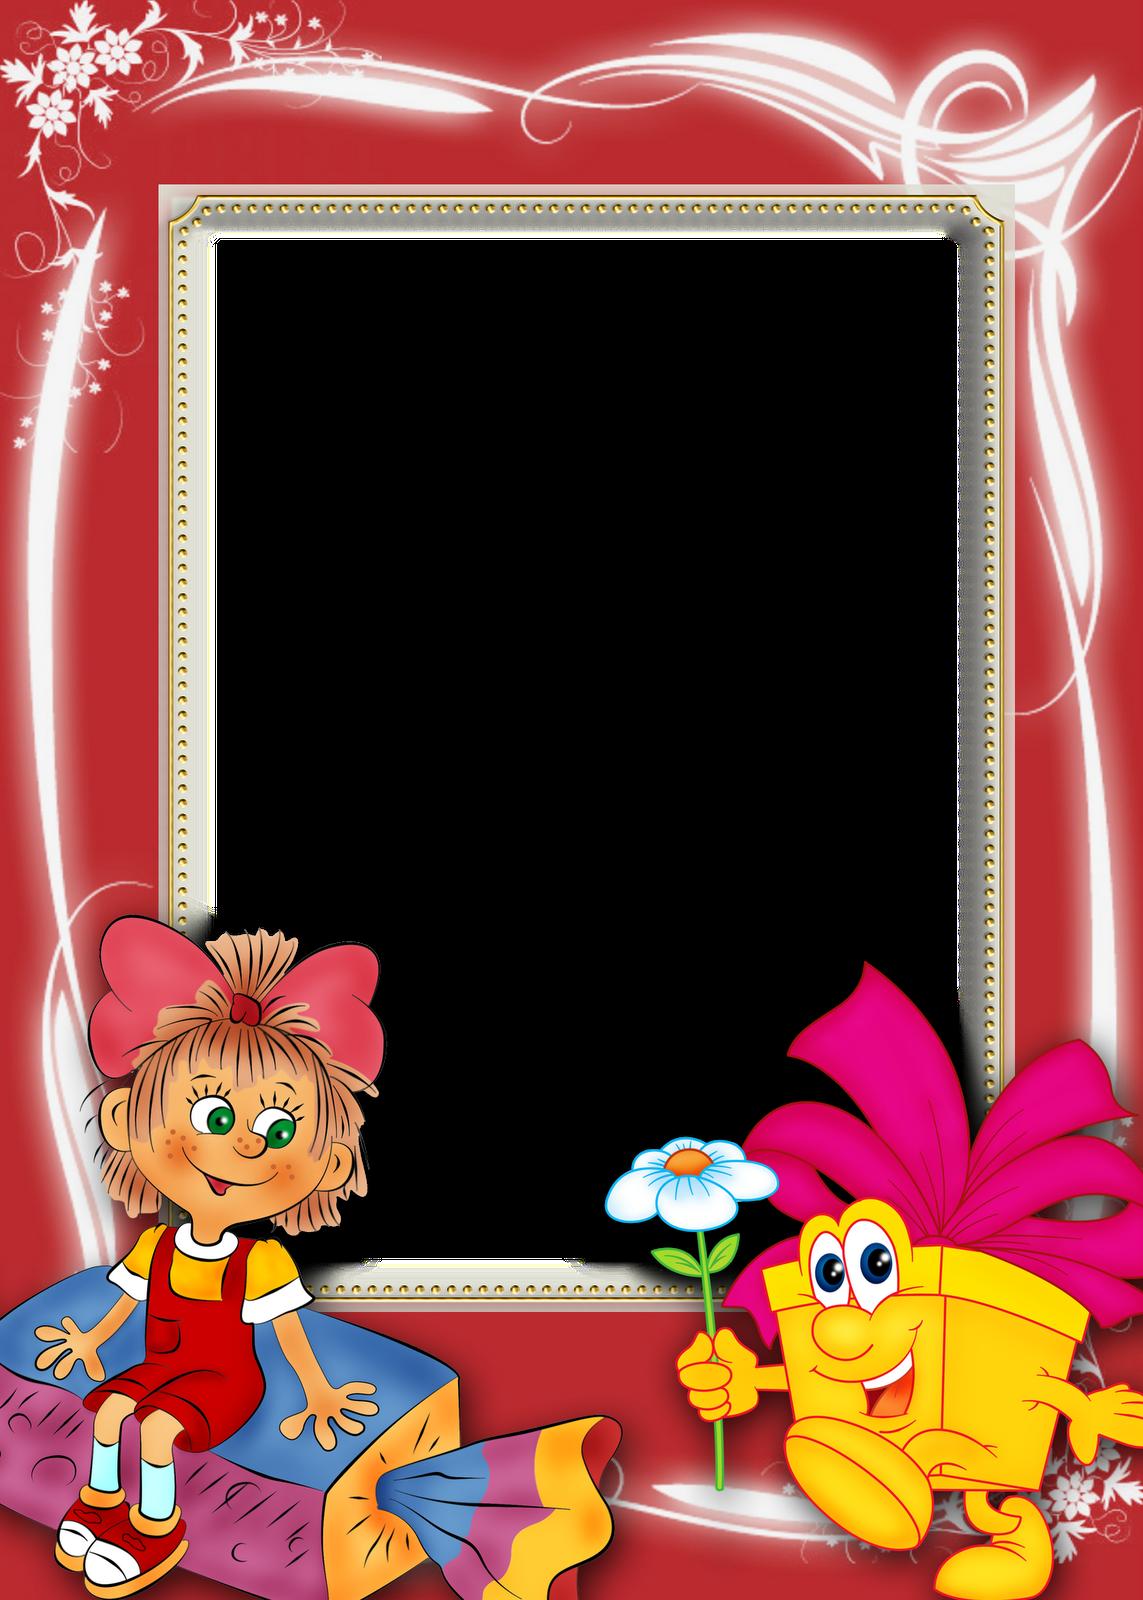 Детские картинки для вставки текста